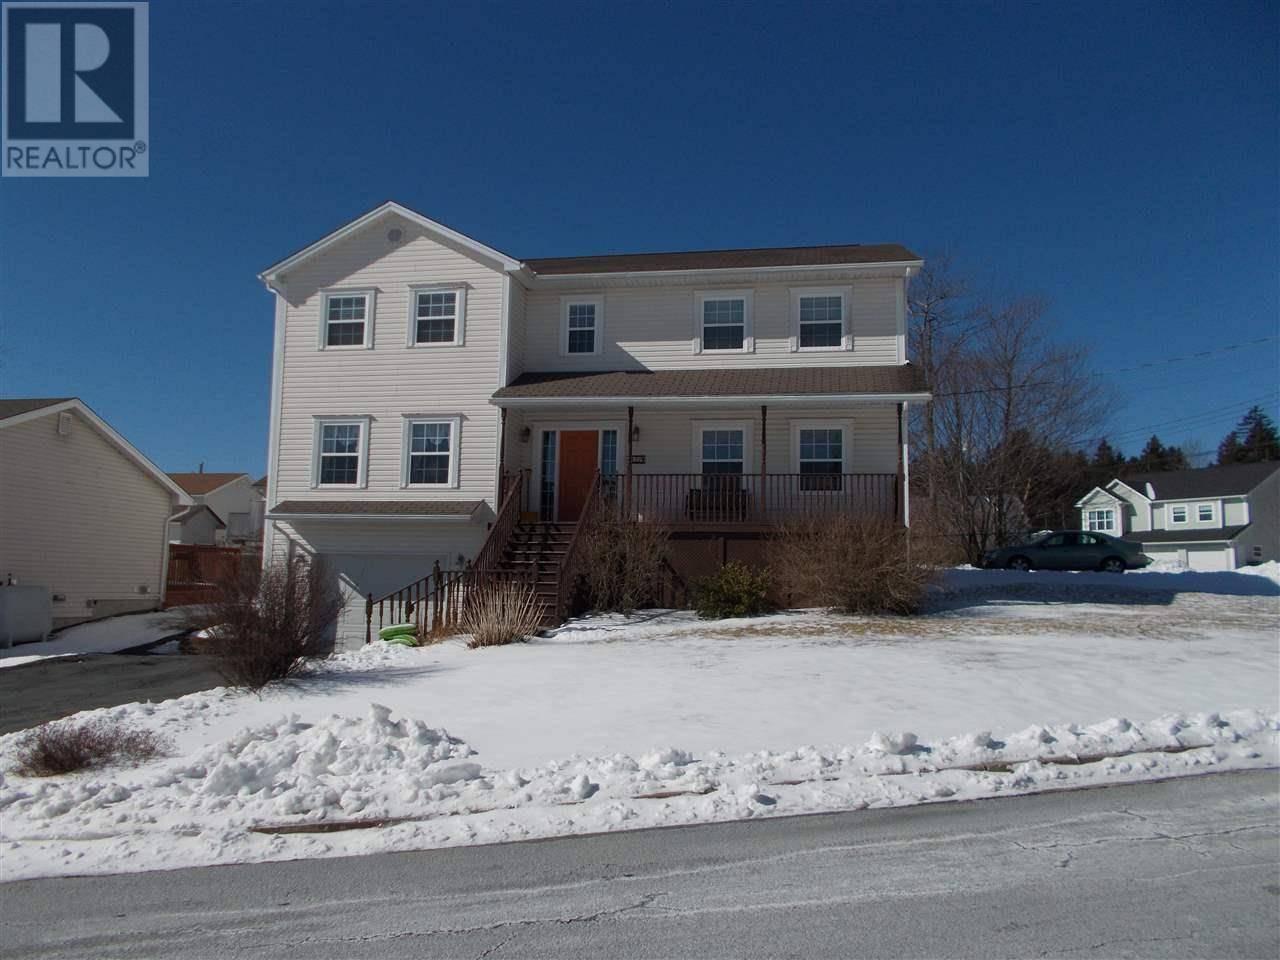 House for sale at 127 Tenon Dr Middle Sackville Nova Scotia - MLS: 201903615